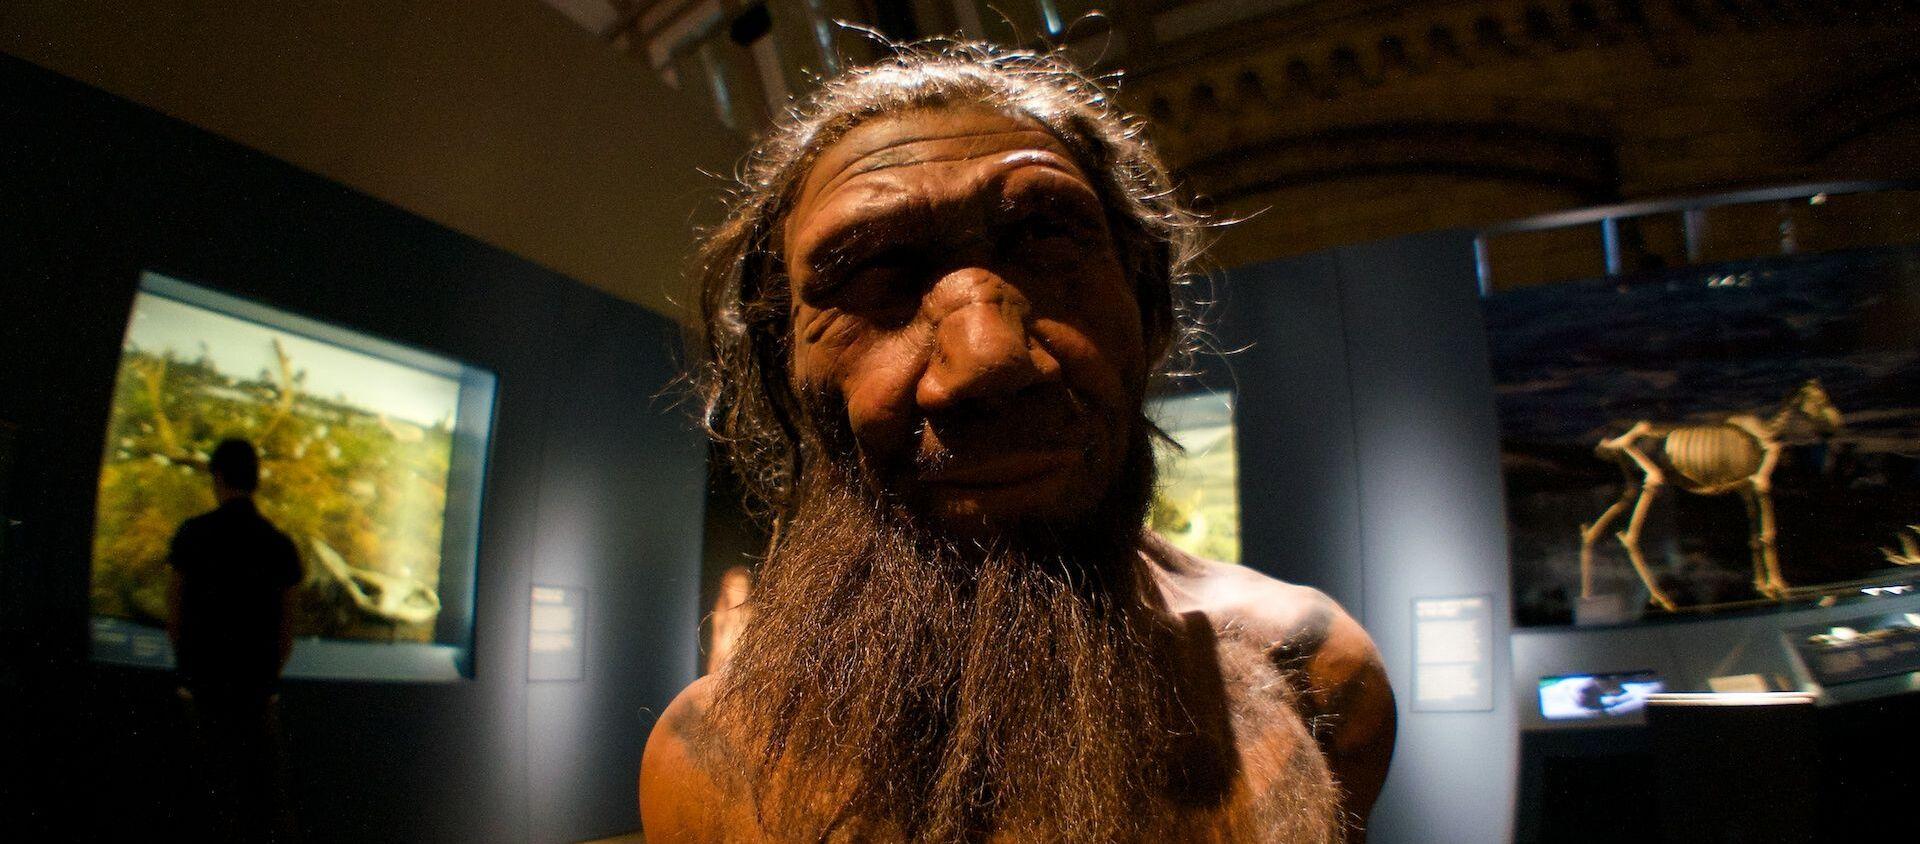 Un neandertal (imagen referencial) - Sputnik Mundo, 1920, 29.09.2020